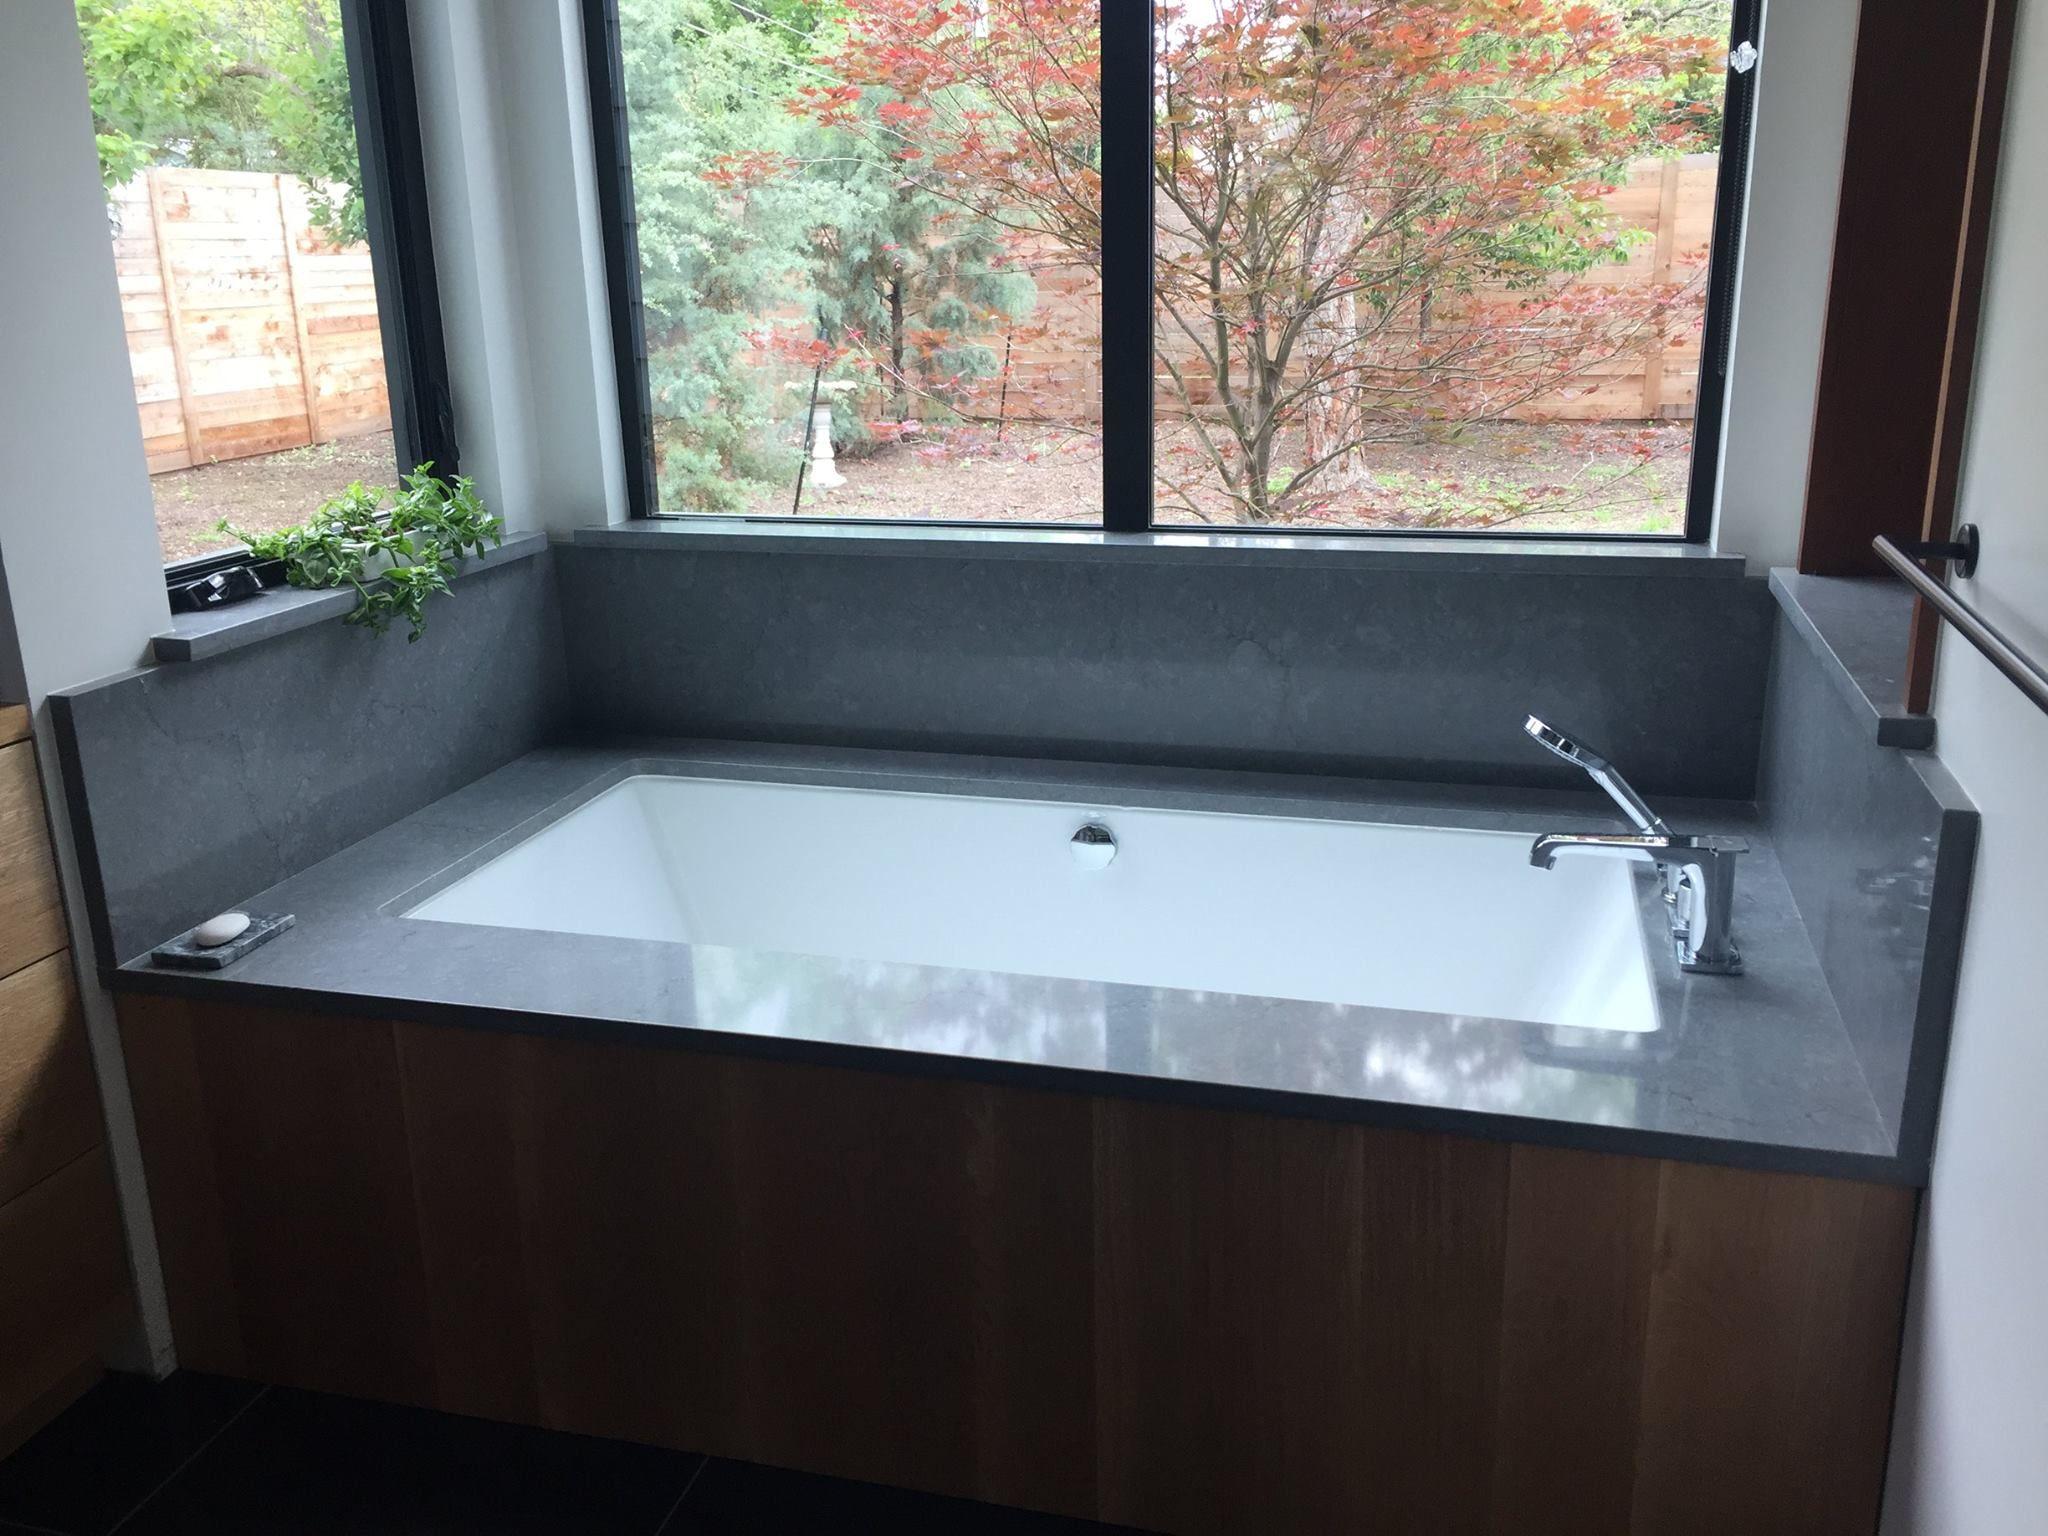 Pin by Triton Stone Group on Bathrooms | Pinterest | Tub surround ...